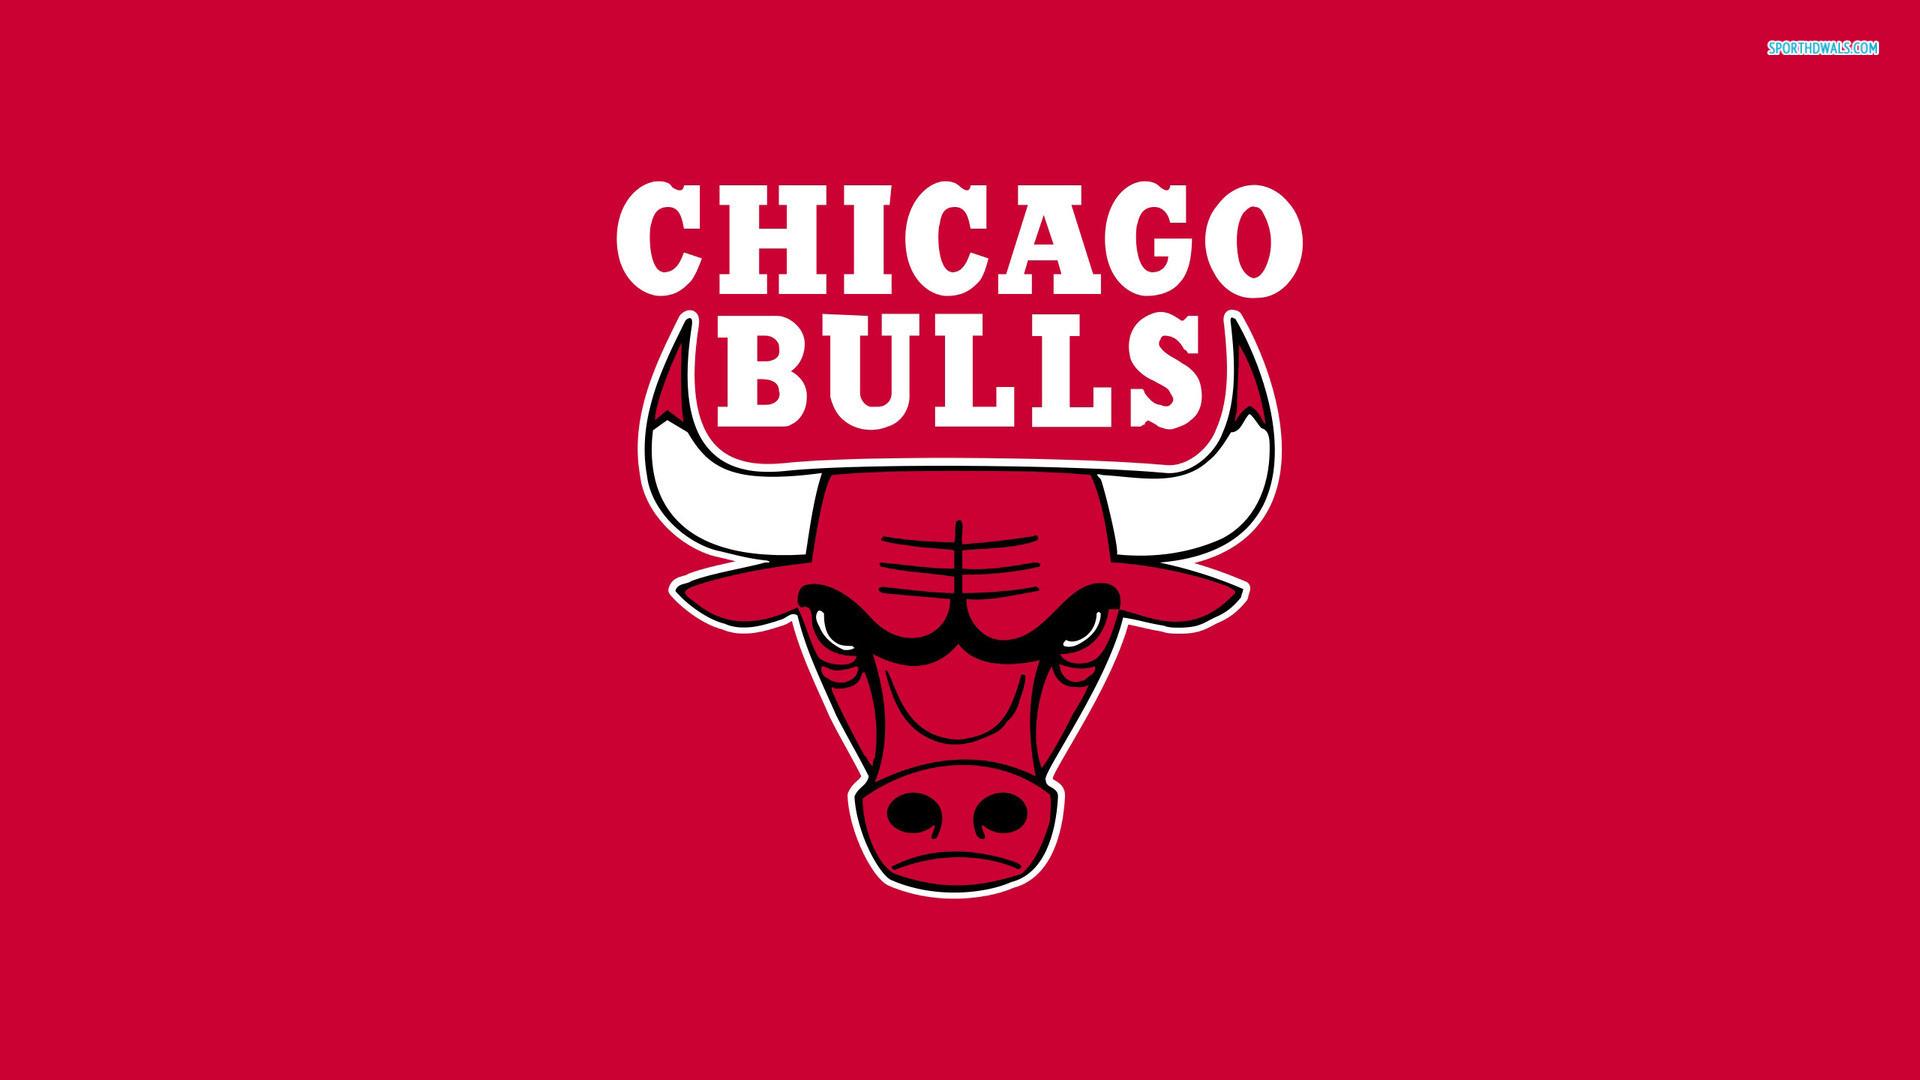 chicago bulls wallpapers HD